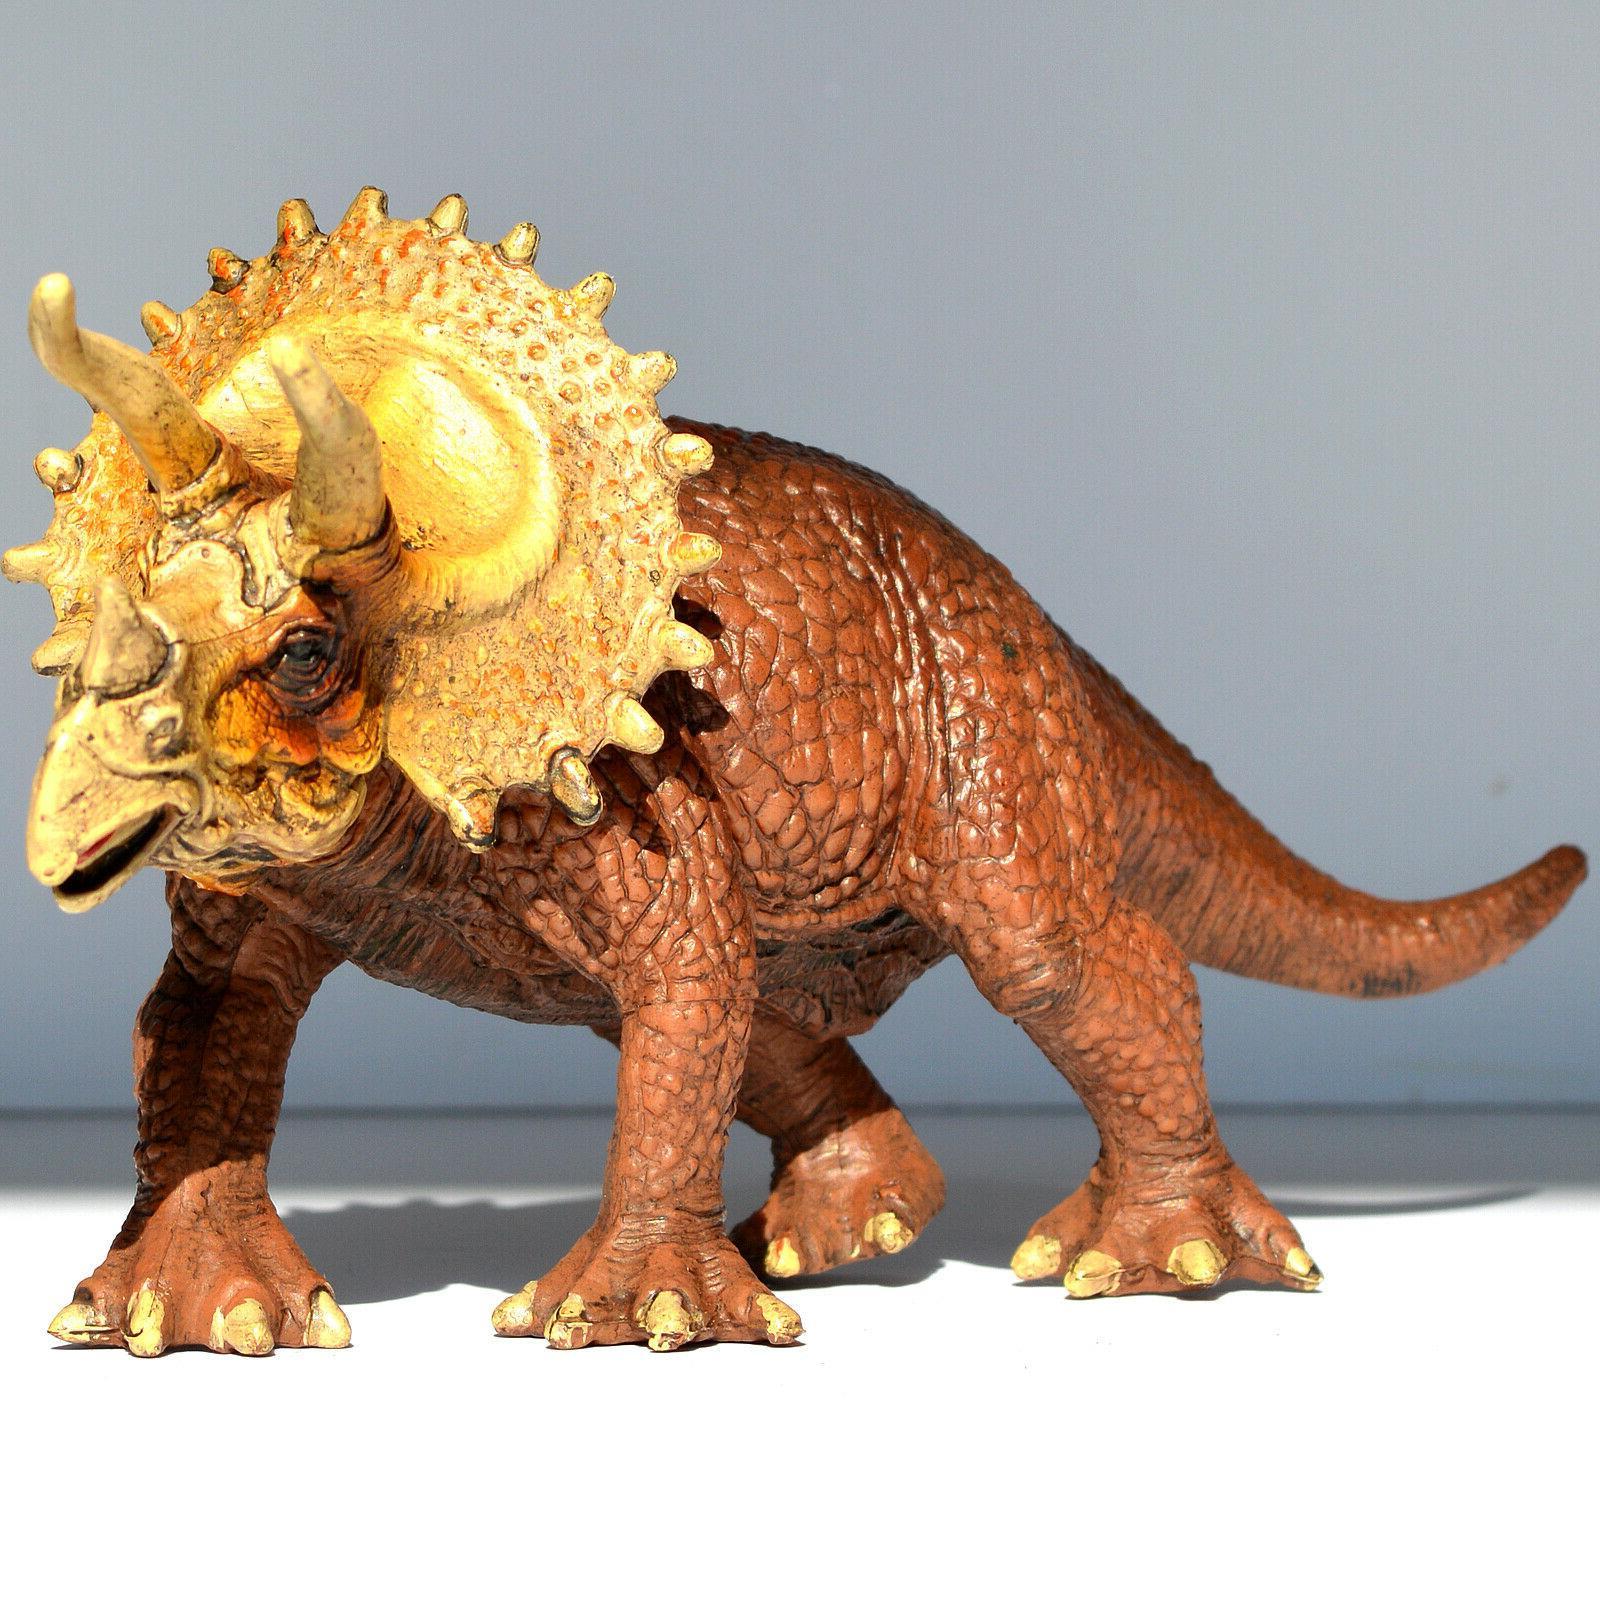 12 large tyrannosaurus rex dinosaur toy model